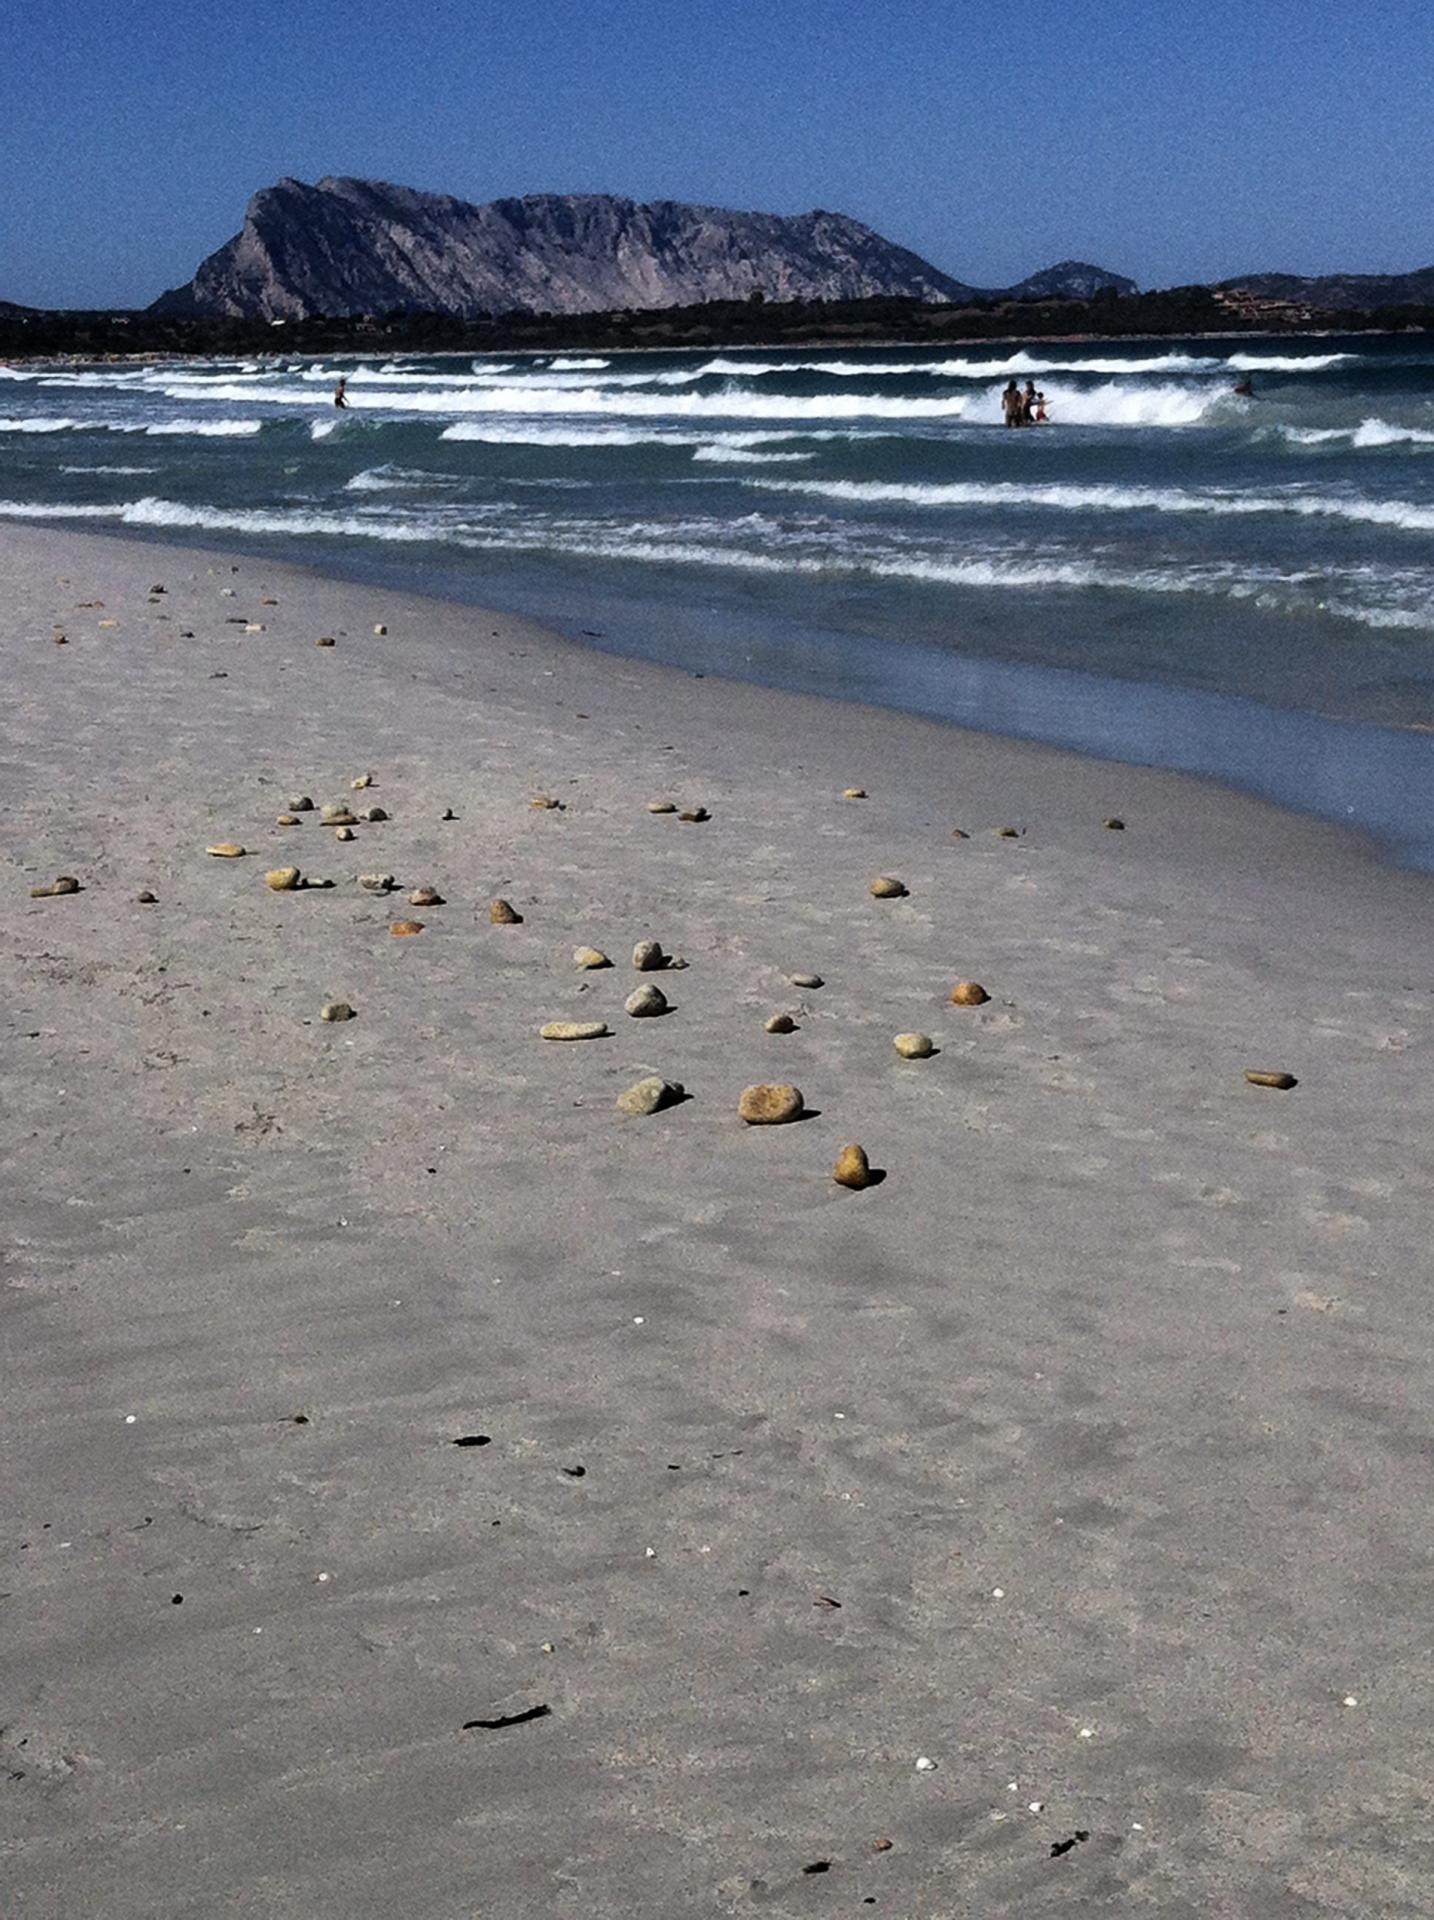 Plage La Cinta et l'Île montagne Tavolara